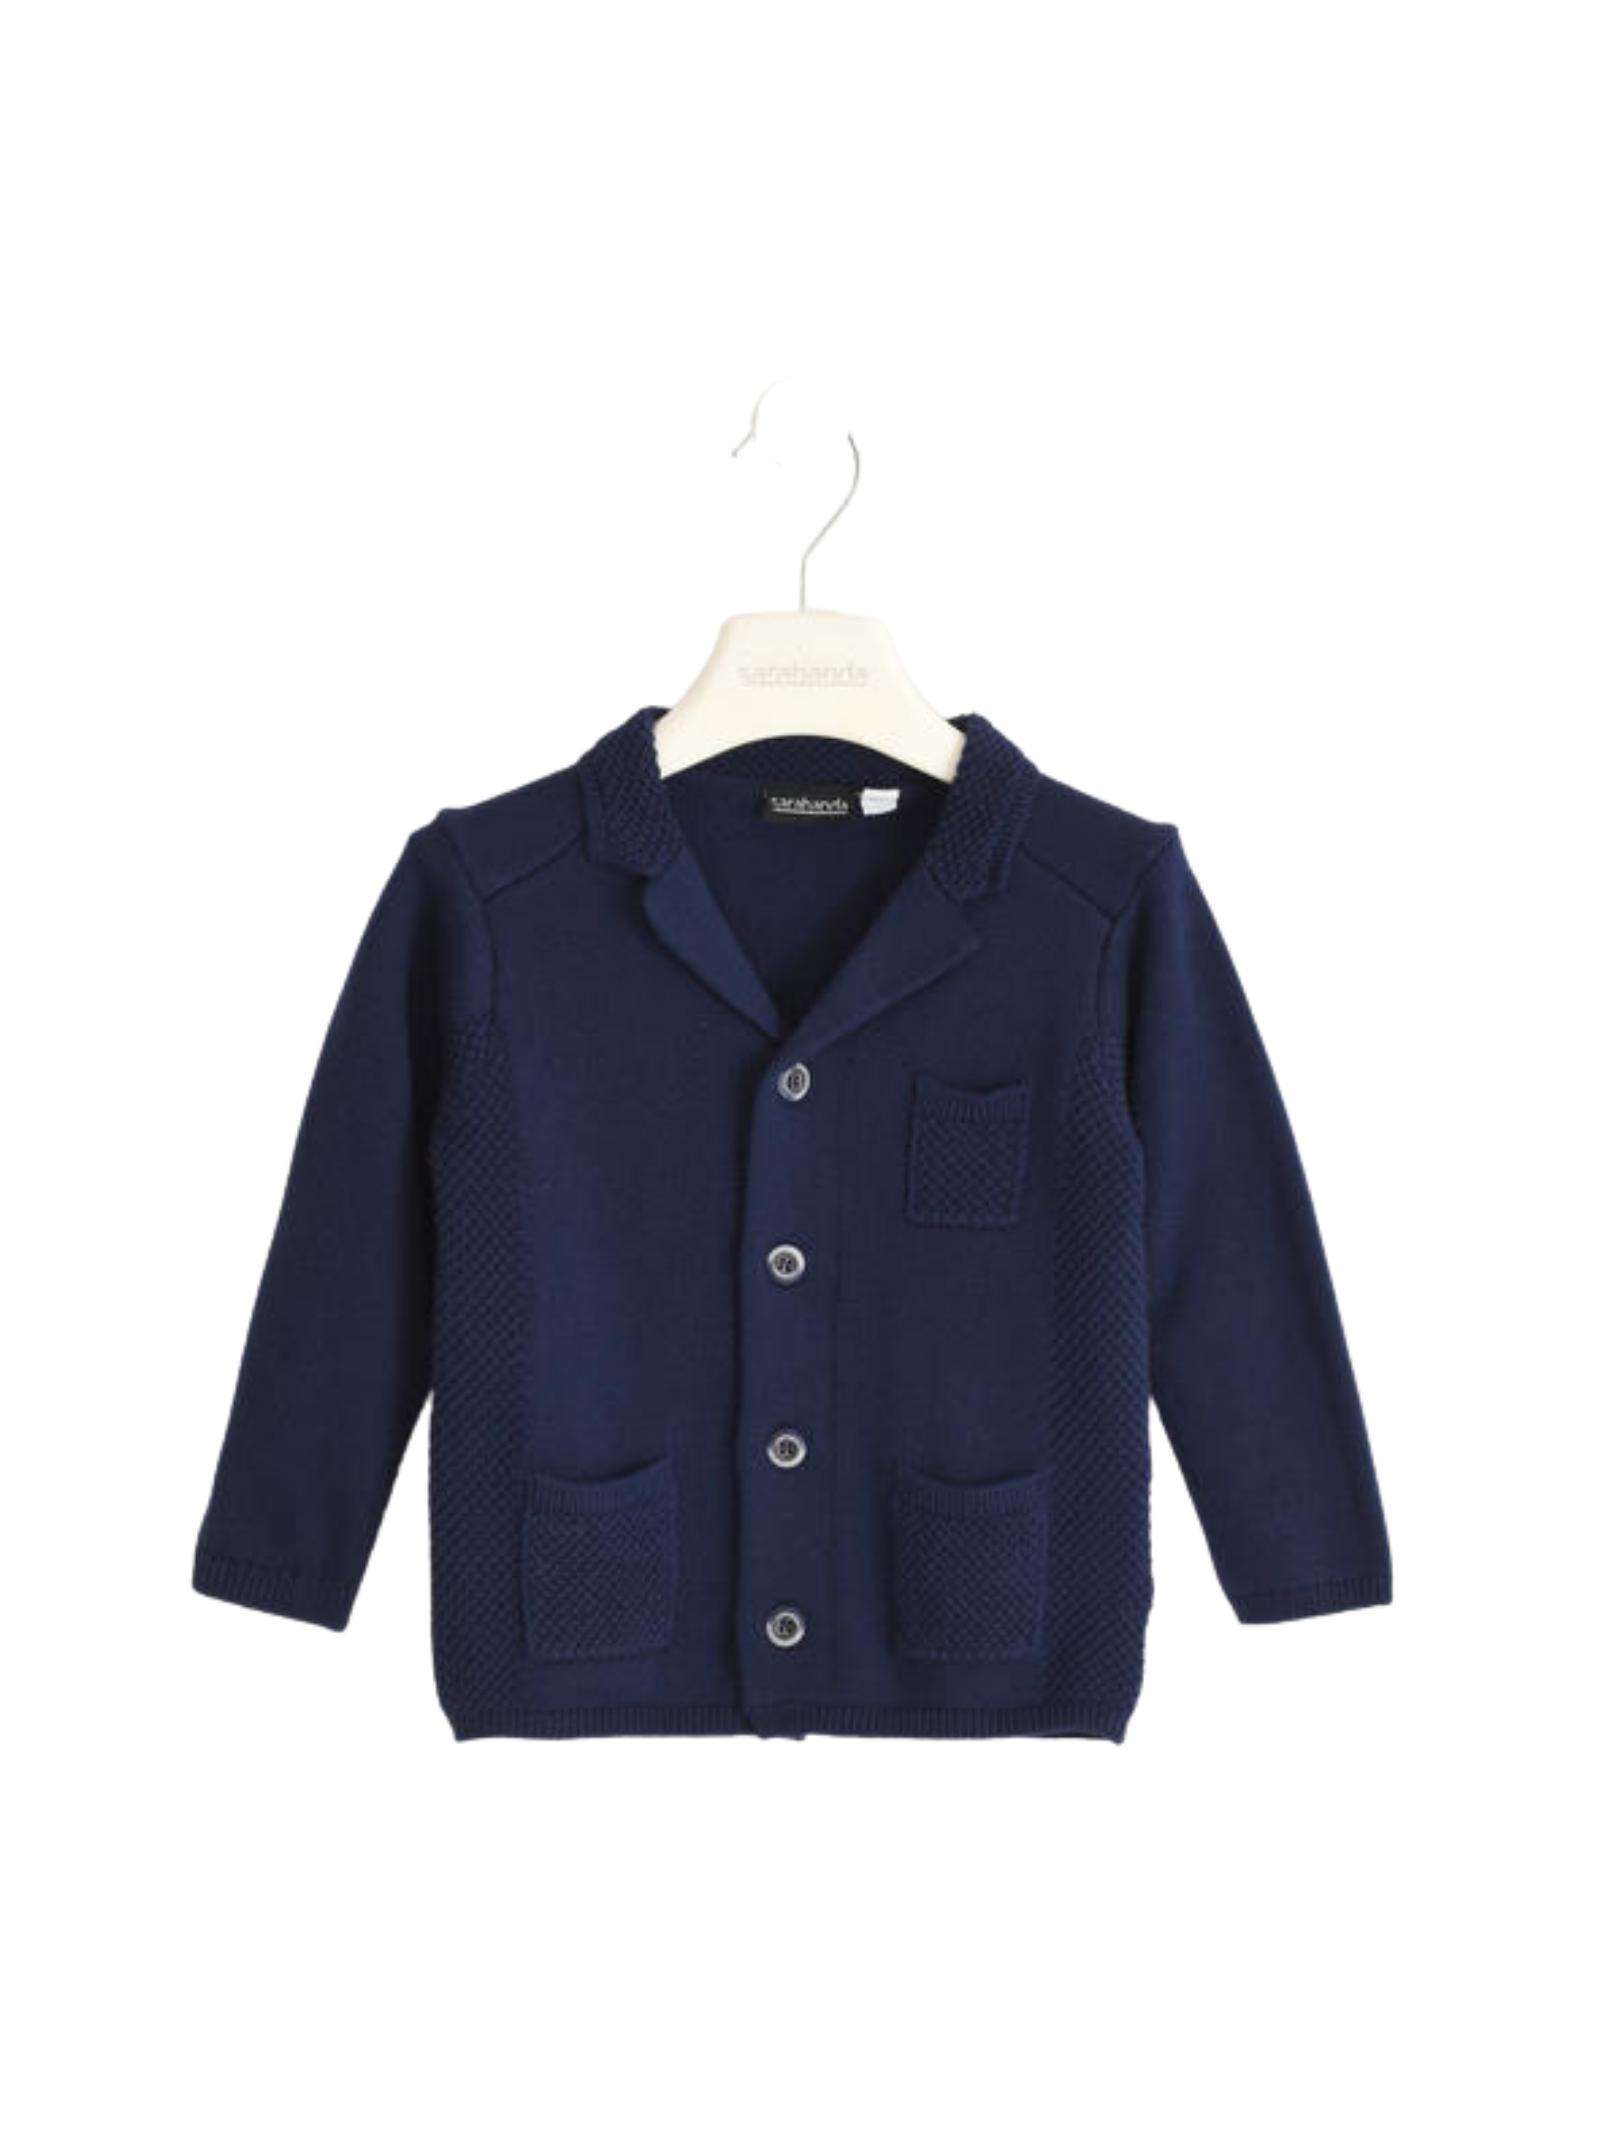 Three Pockets Baby Cardigan SARABANDA | Sweaters | 03103003854